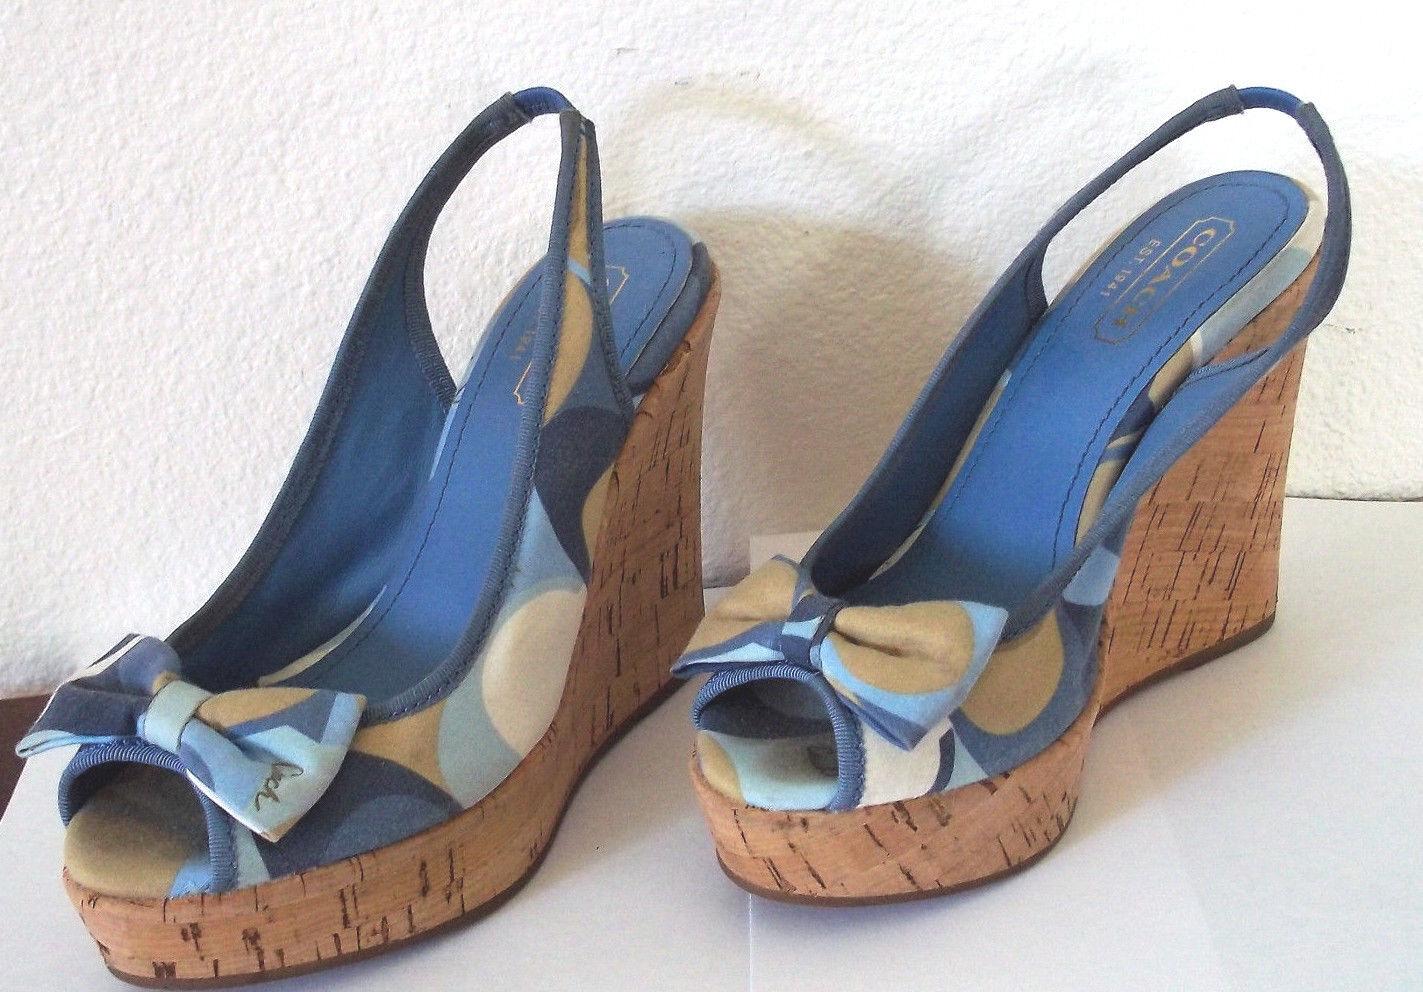 Gorgeous Coach women's fashion summer wedge platform sandal w/bow shoes Size 5!